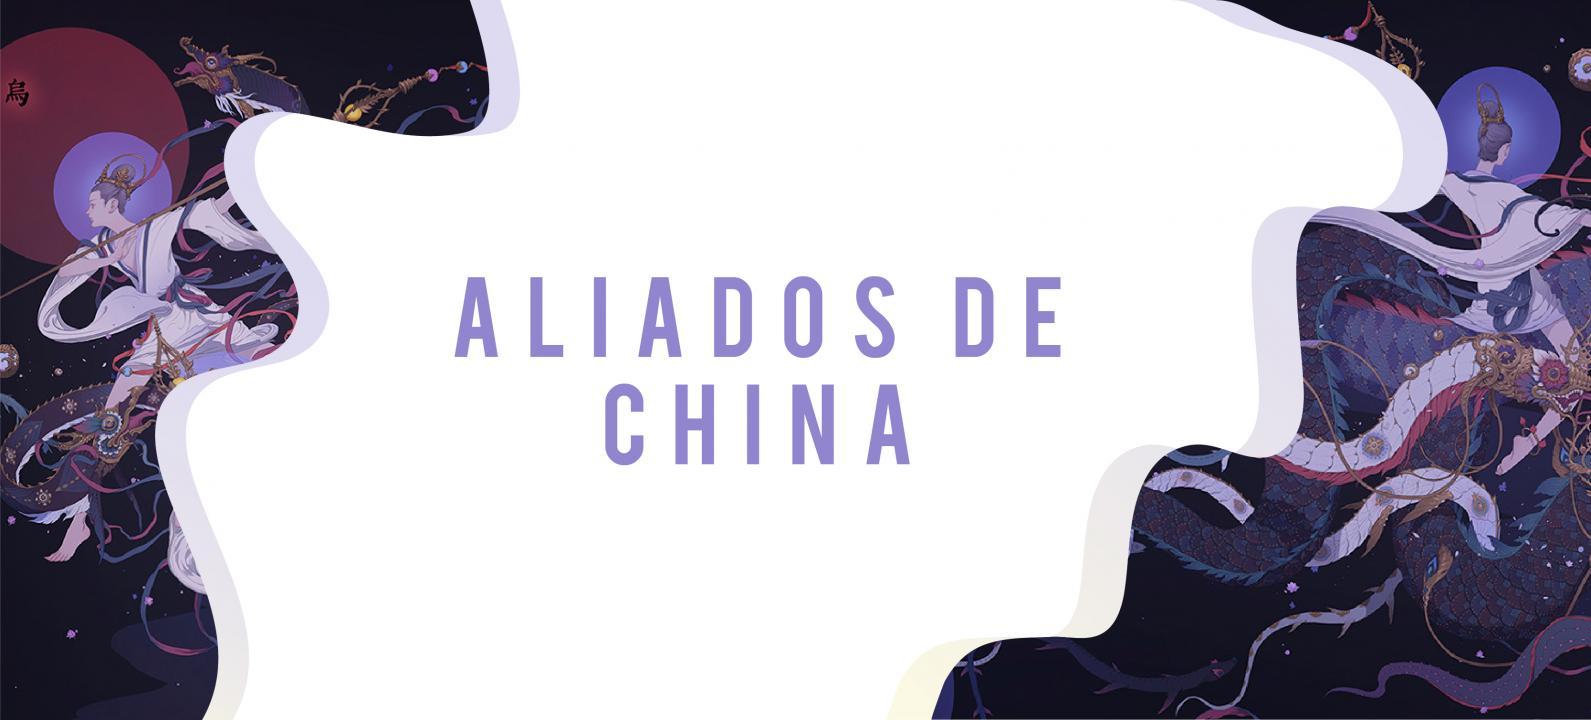 Banner Aliados de China